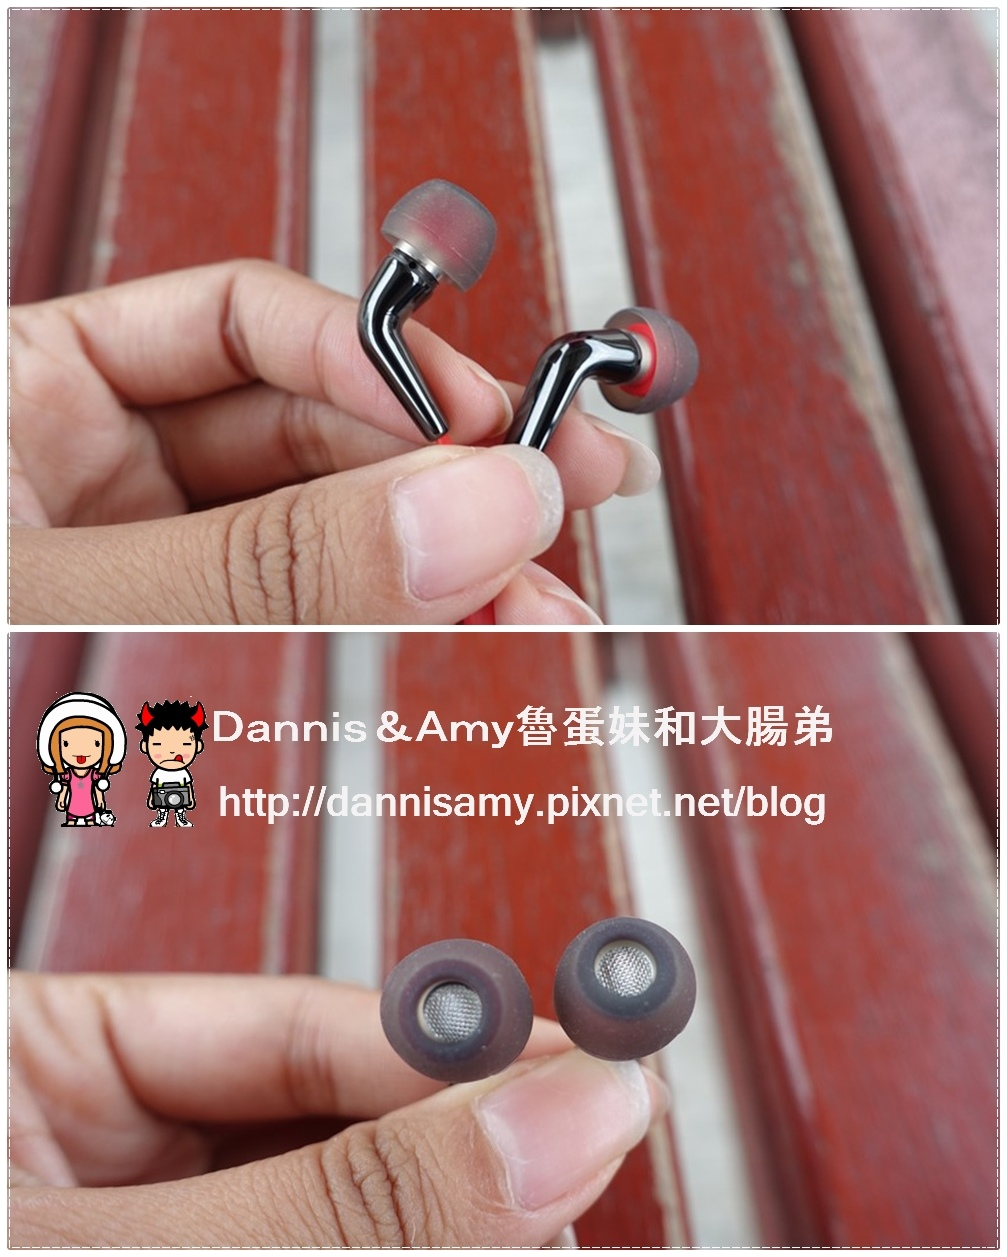 BONNAIRE】 MX-220i 奈米陶瓷入耳式iPhone線控耳機 (4).jpg